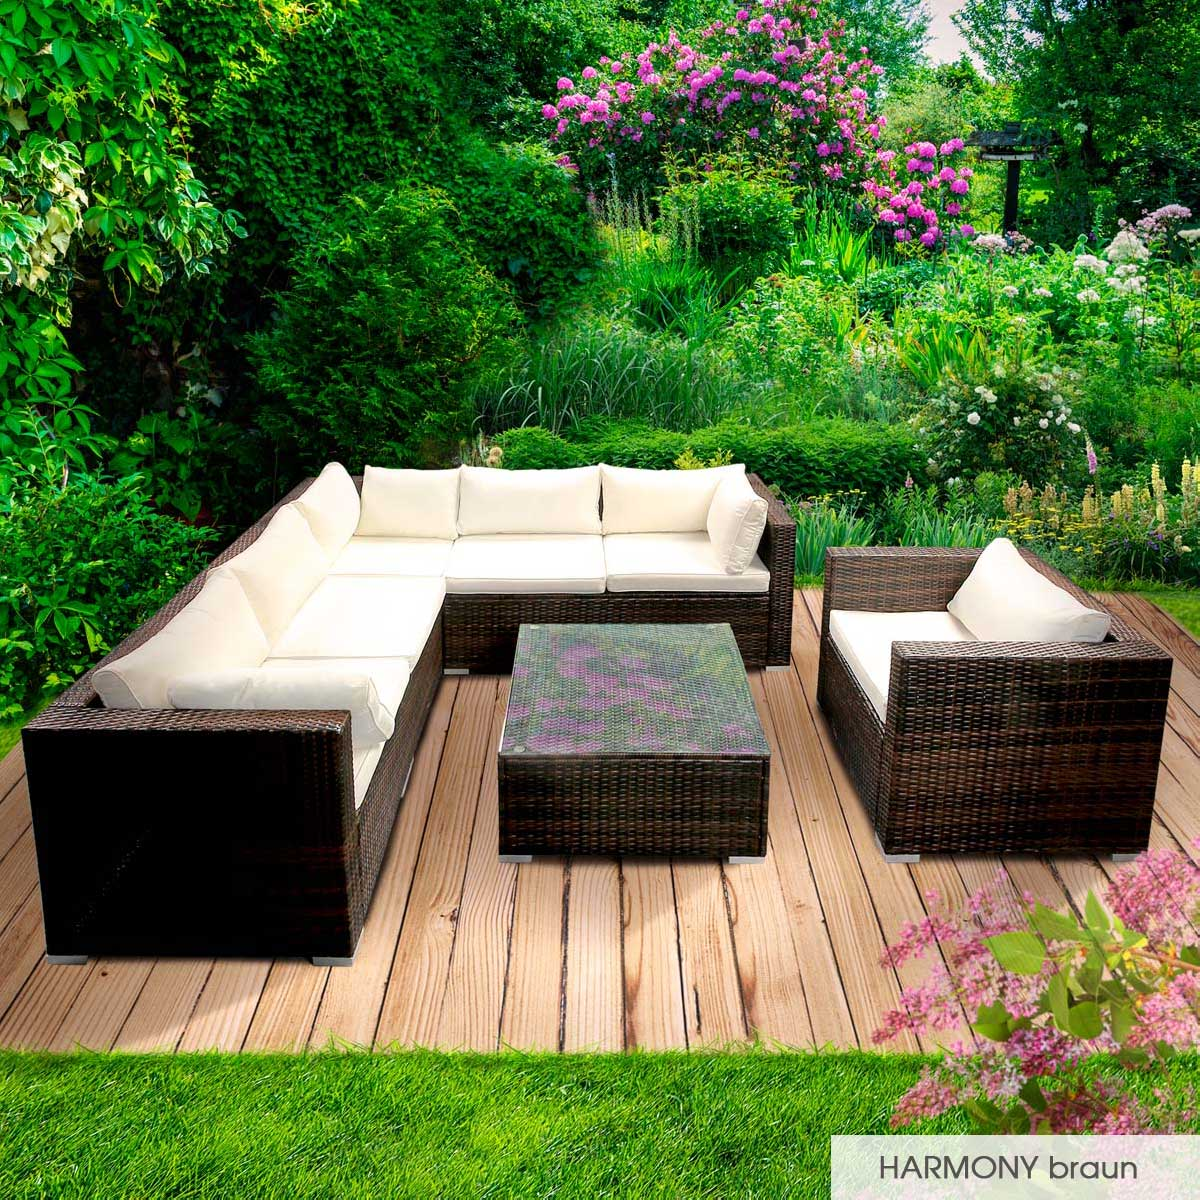 Gartenmoebel-Poly-Rattan-Lounge-Moebel-Sitzgarnitur-Gartengarnitur-Sitzgruppe-Sofa Indexbild 23